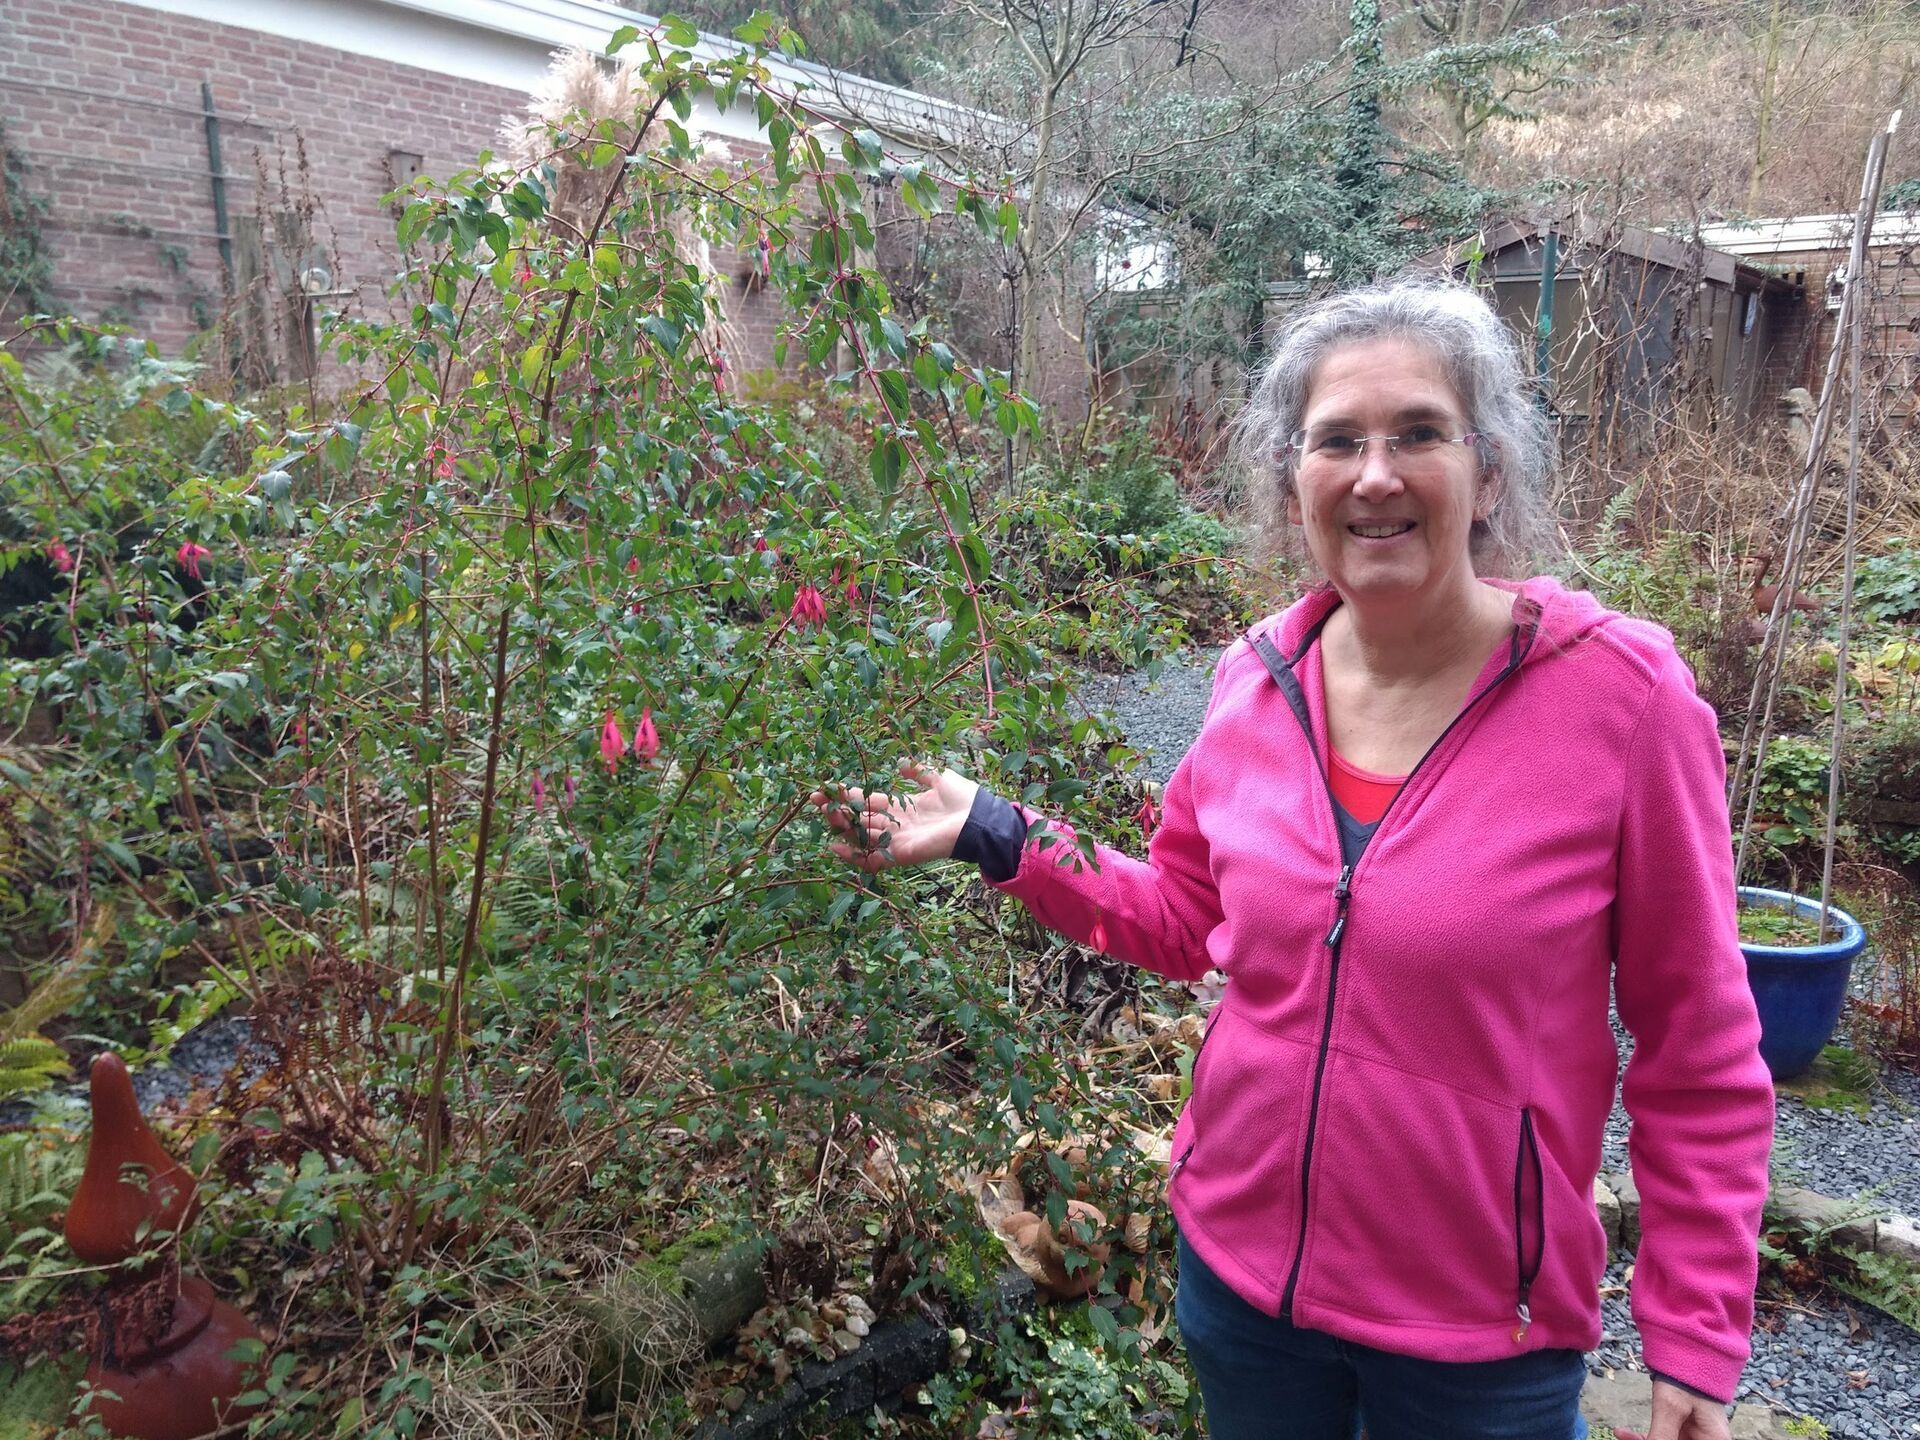 Tinka Chabot - S-kwadraat - Duurzaamste Hovenier 2019